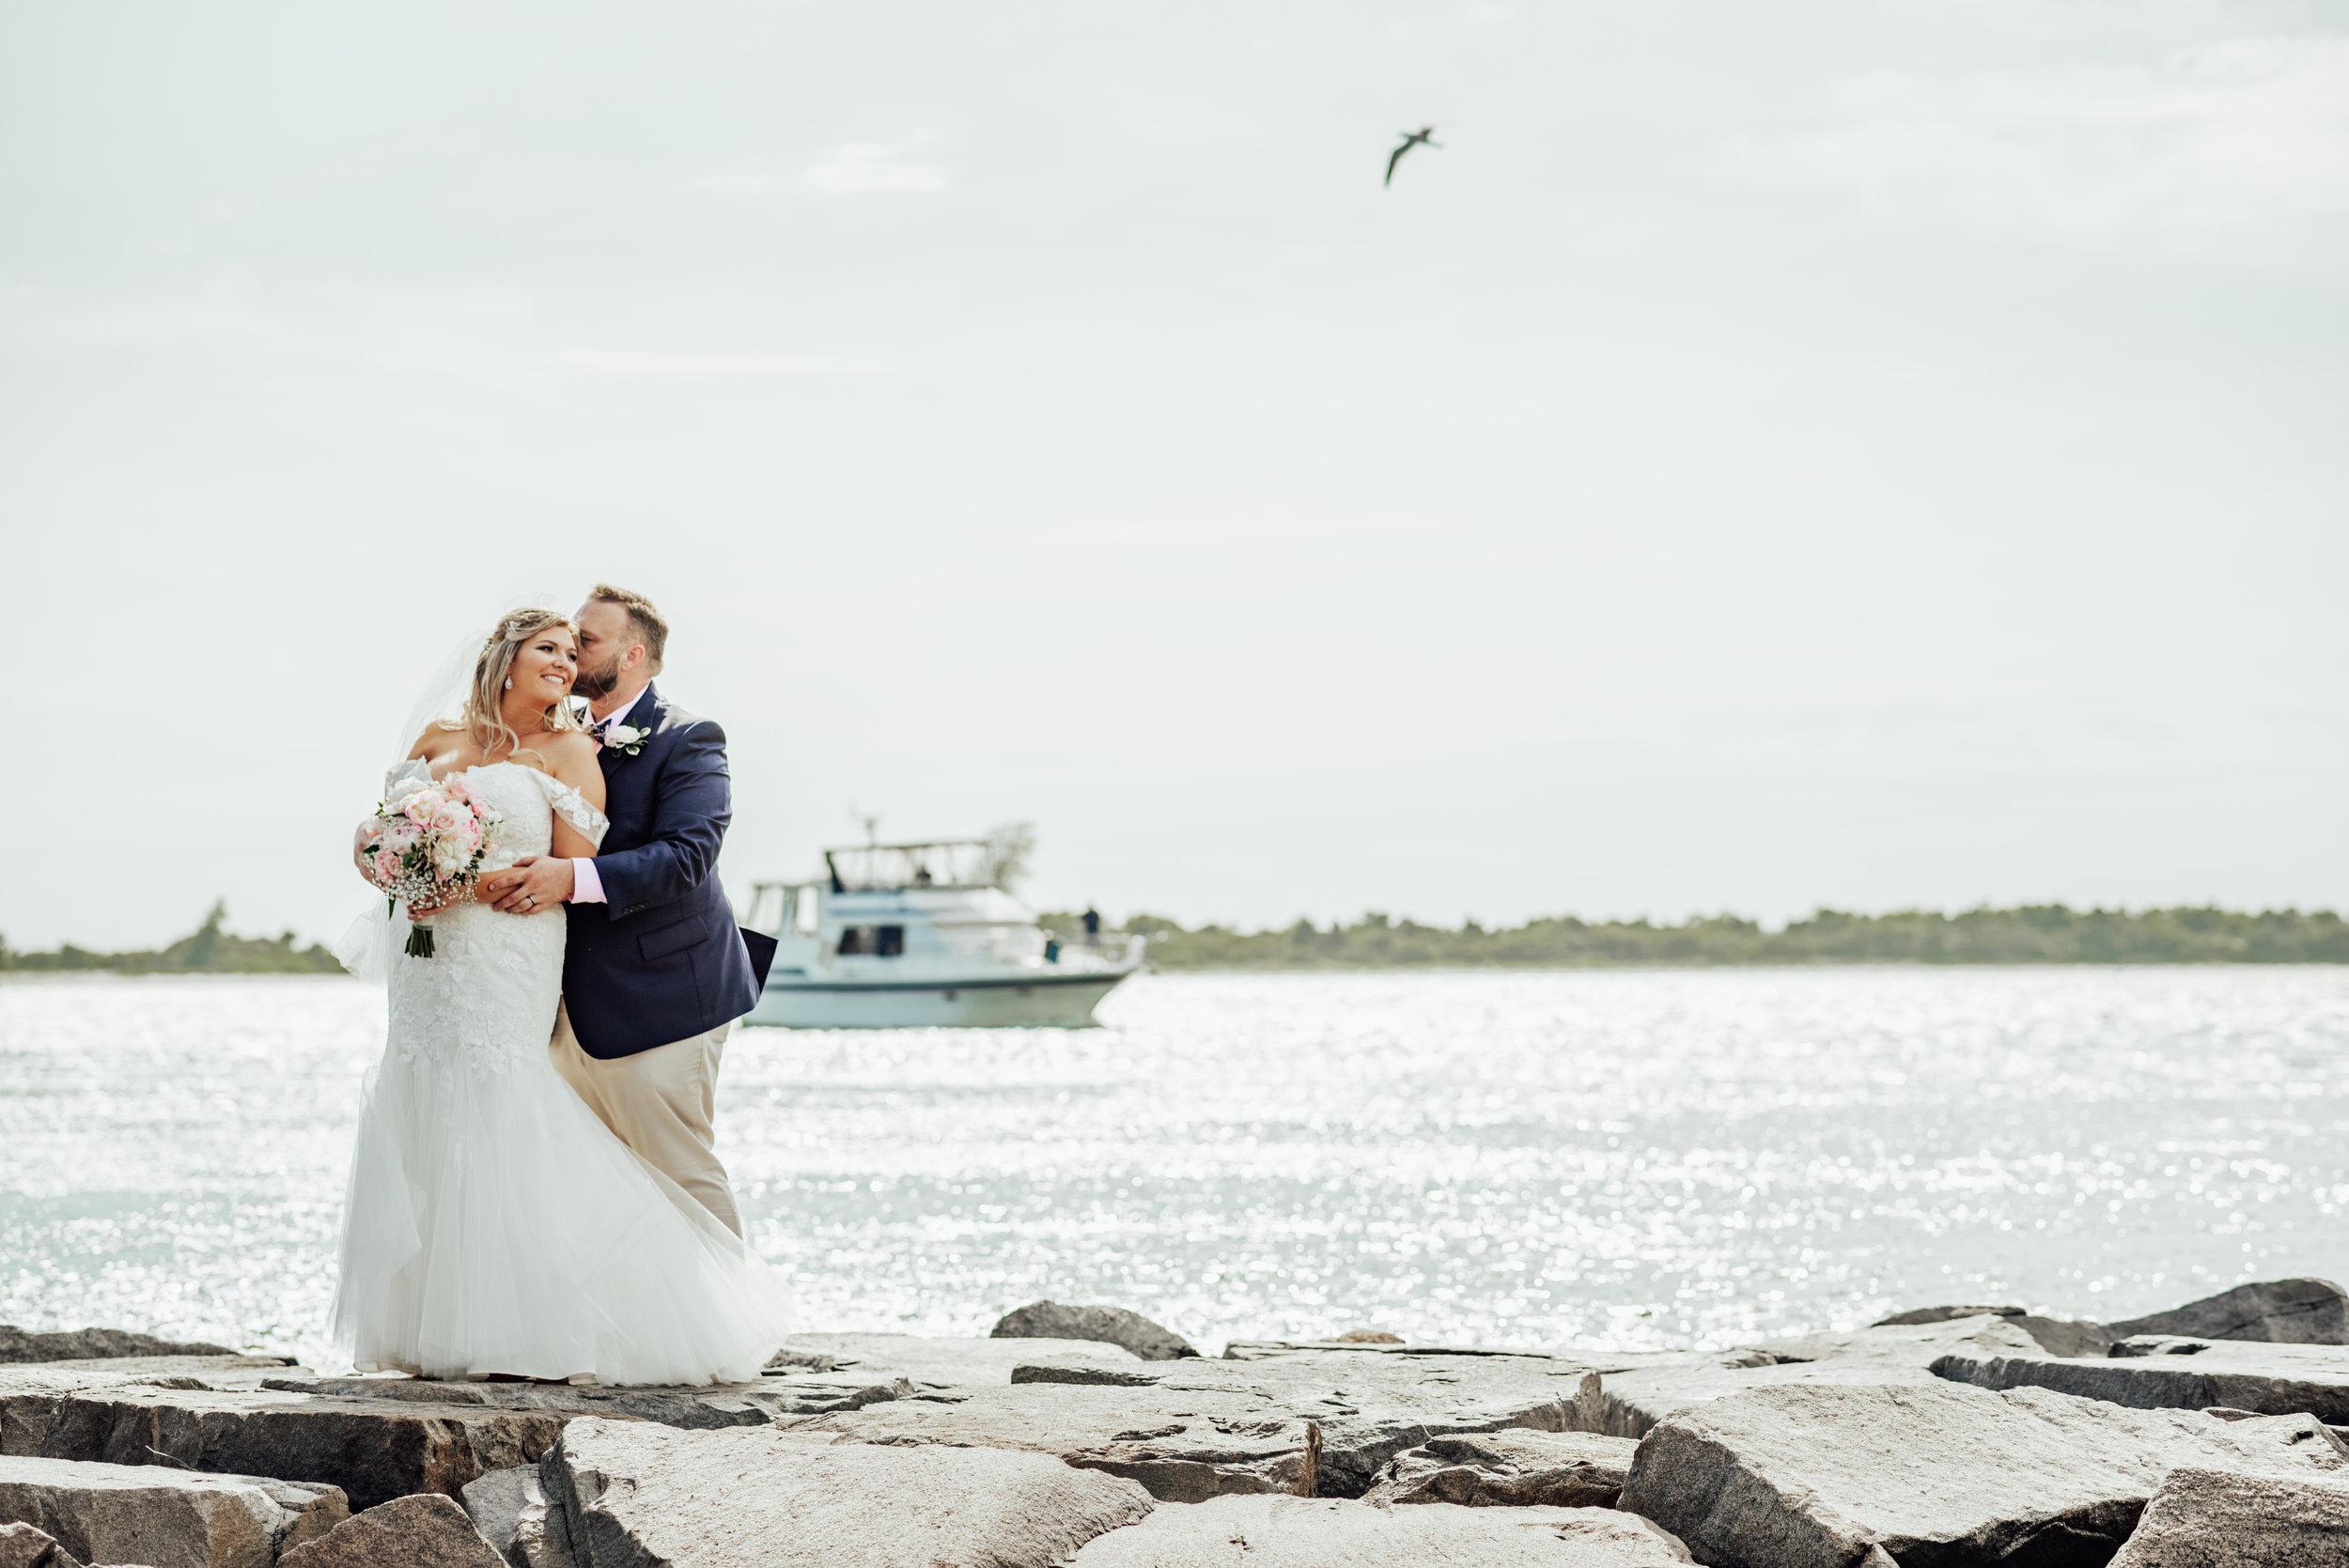 New Jersey Wedding Photographer, Felsberg Photography LBI wedding photography 77.jpg